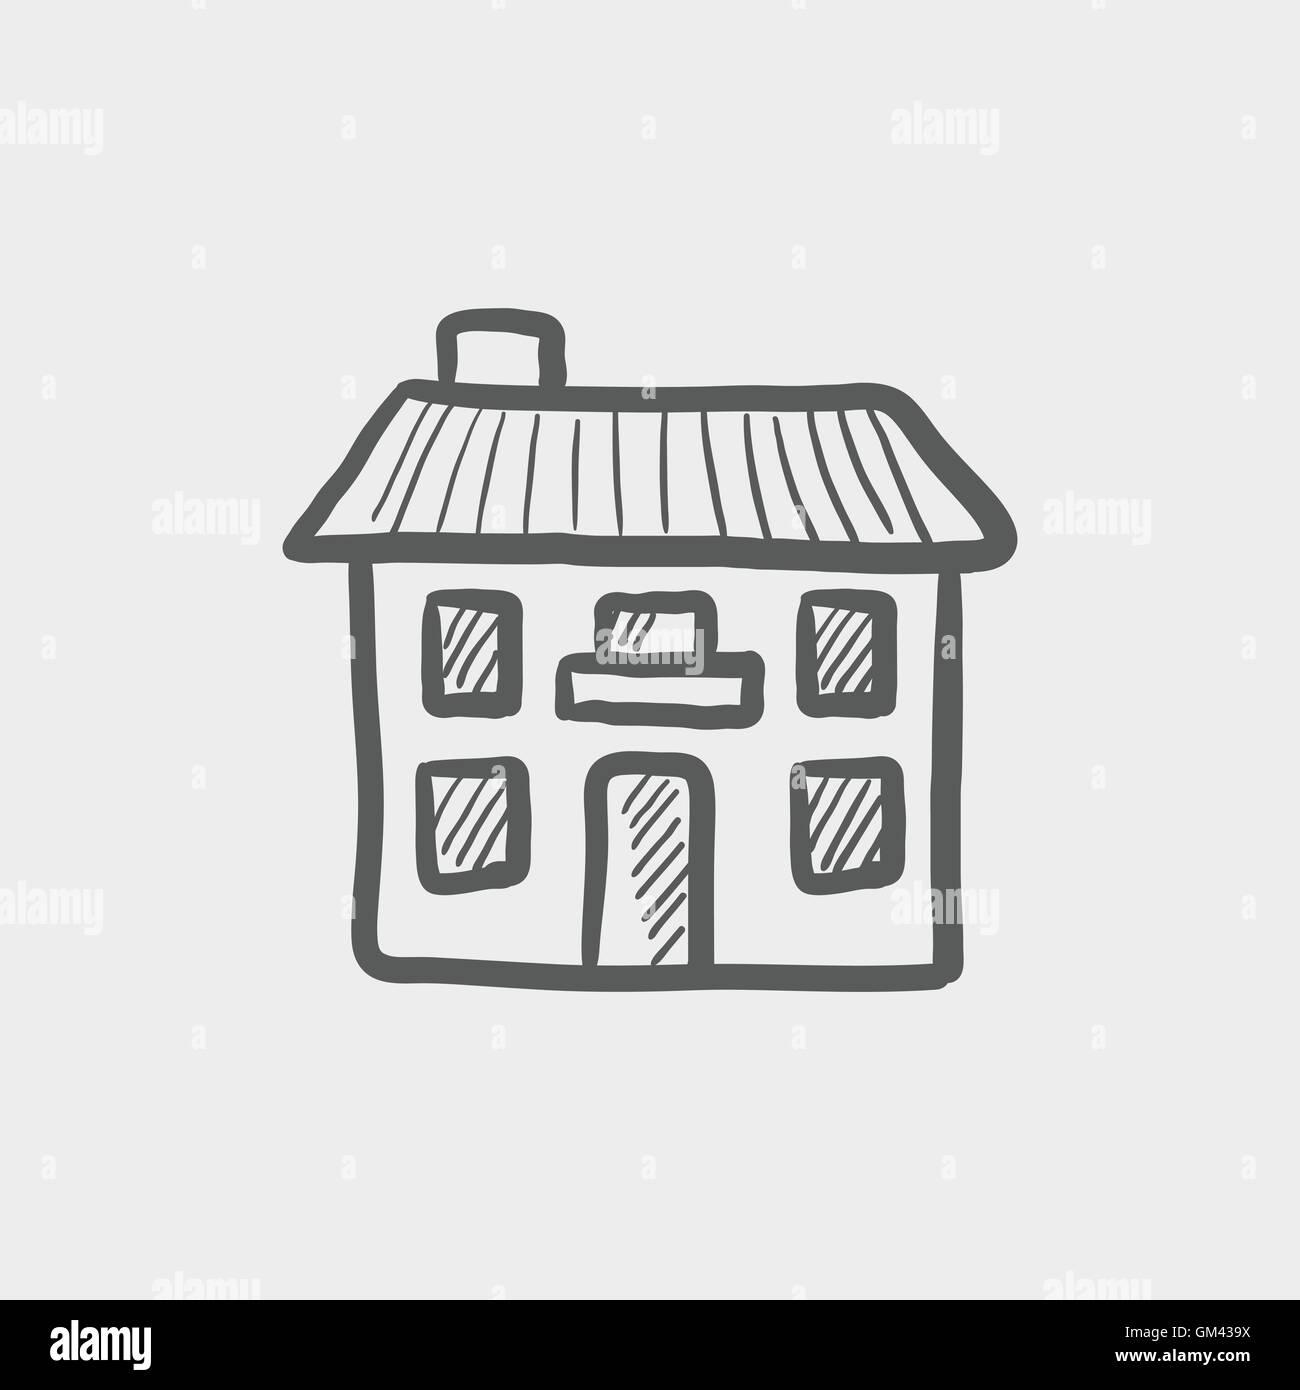 Real estate house sketch icon - Stock Vector